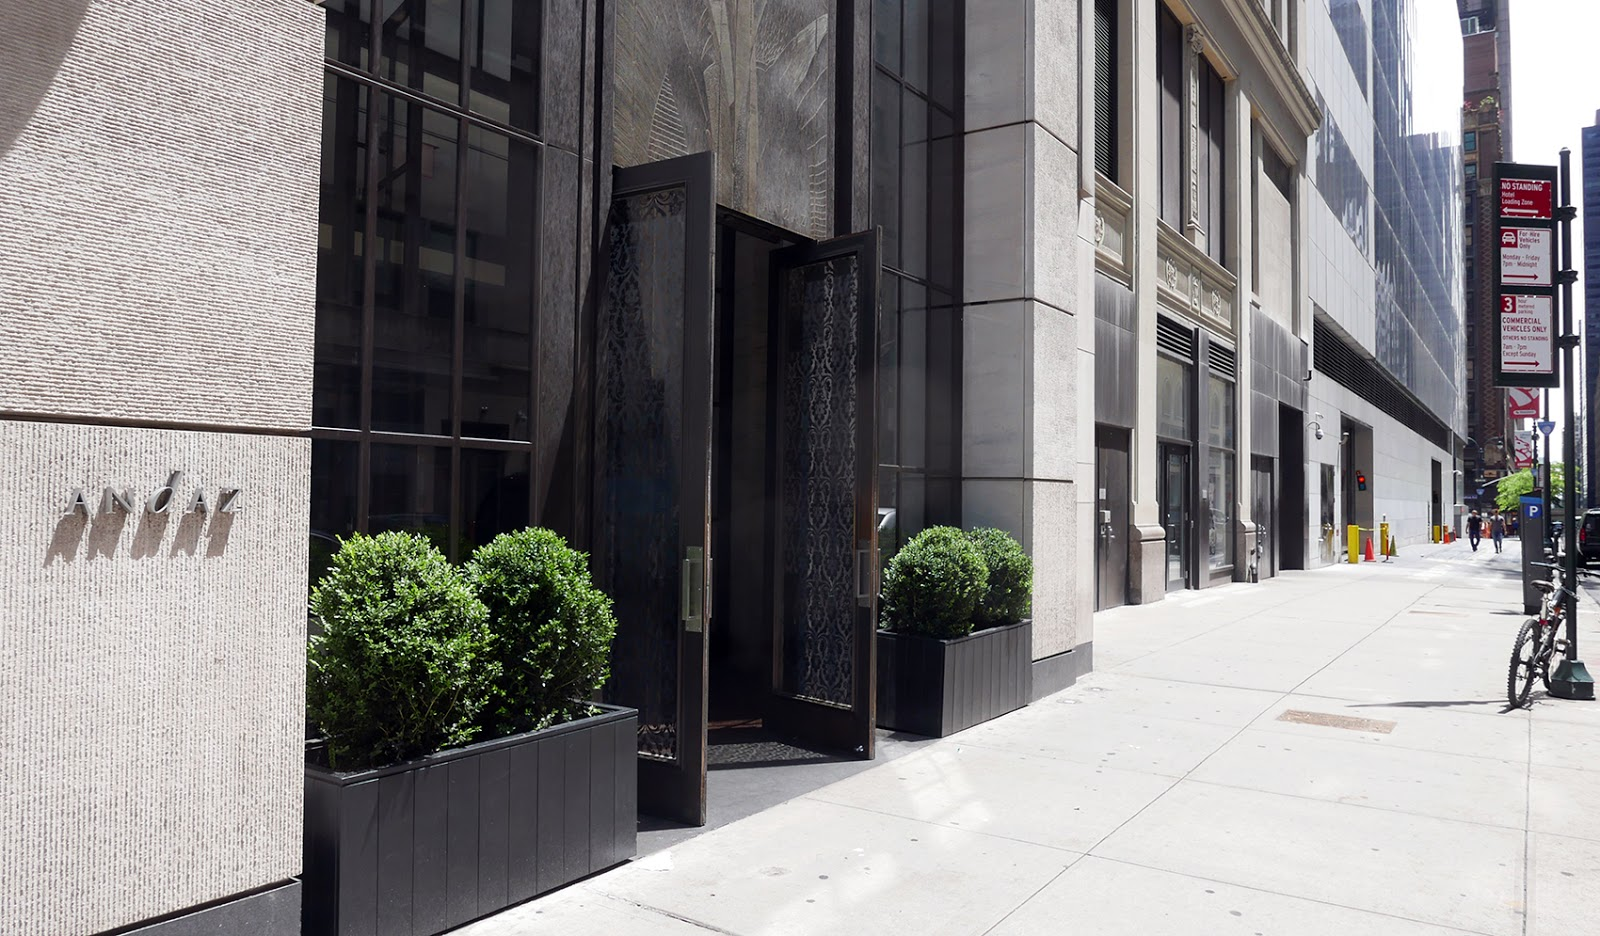 Euriental   fashion & luxury travel   Andaz 5th Avenue Terrace Suite, New York